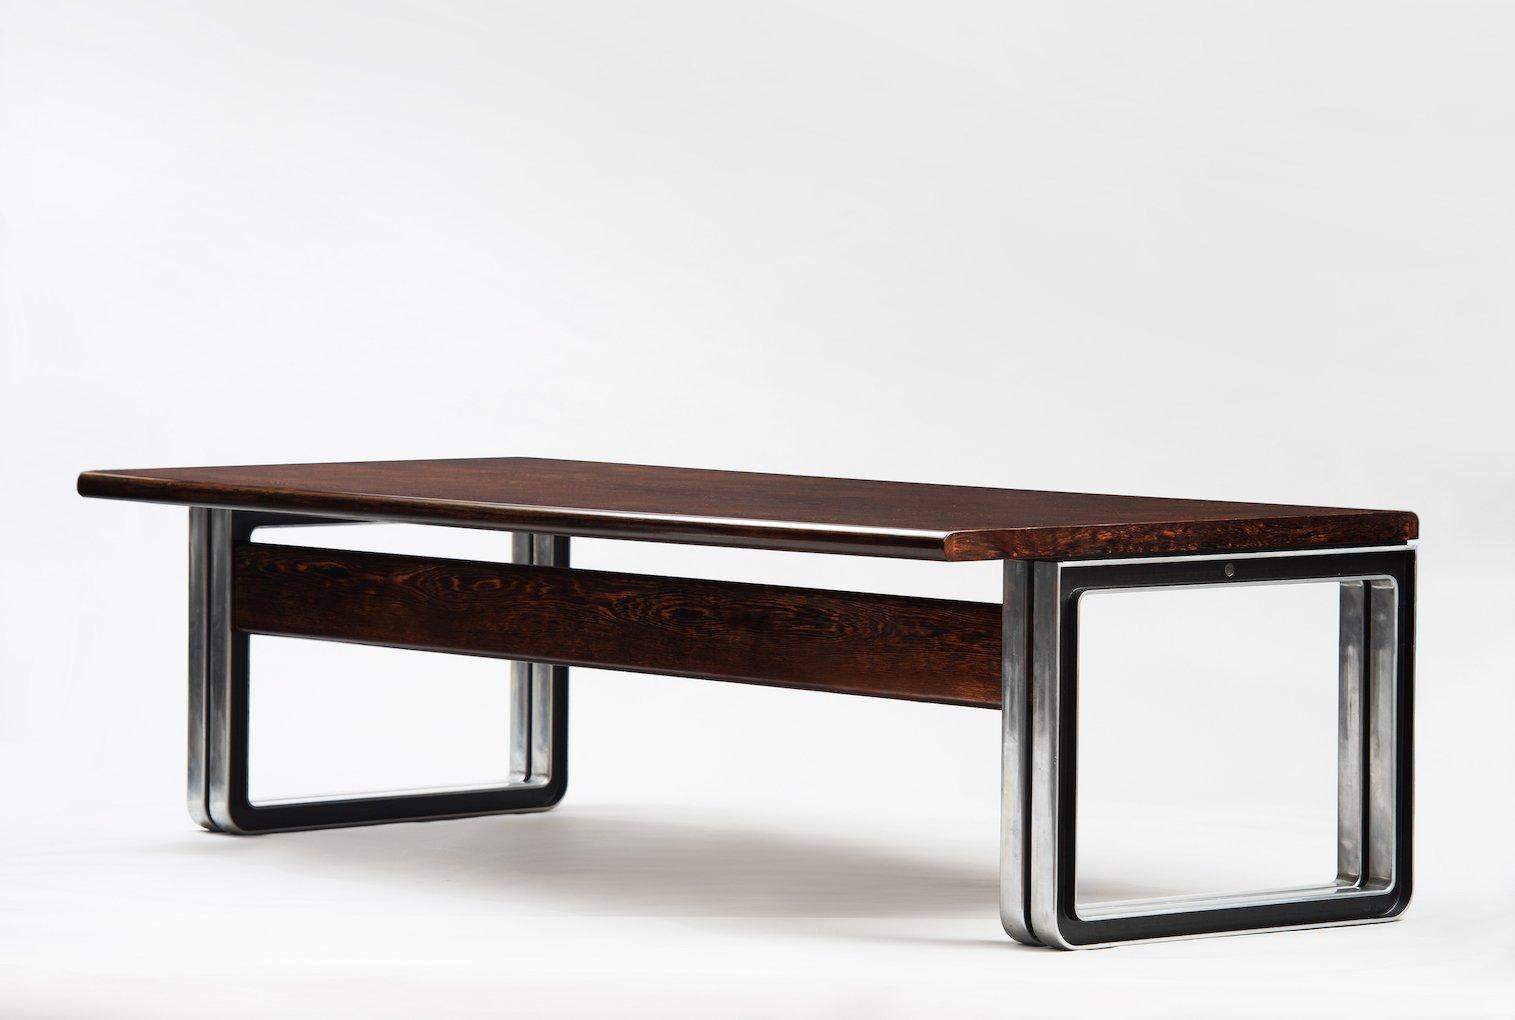 Bureau vintage en weng par osvaldo borsani pour tecno en for Bureau wenge